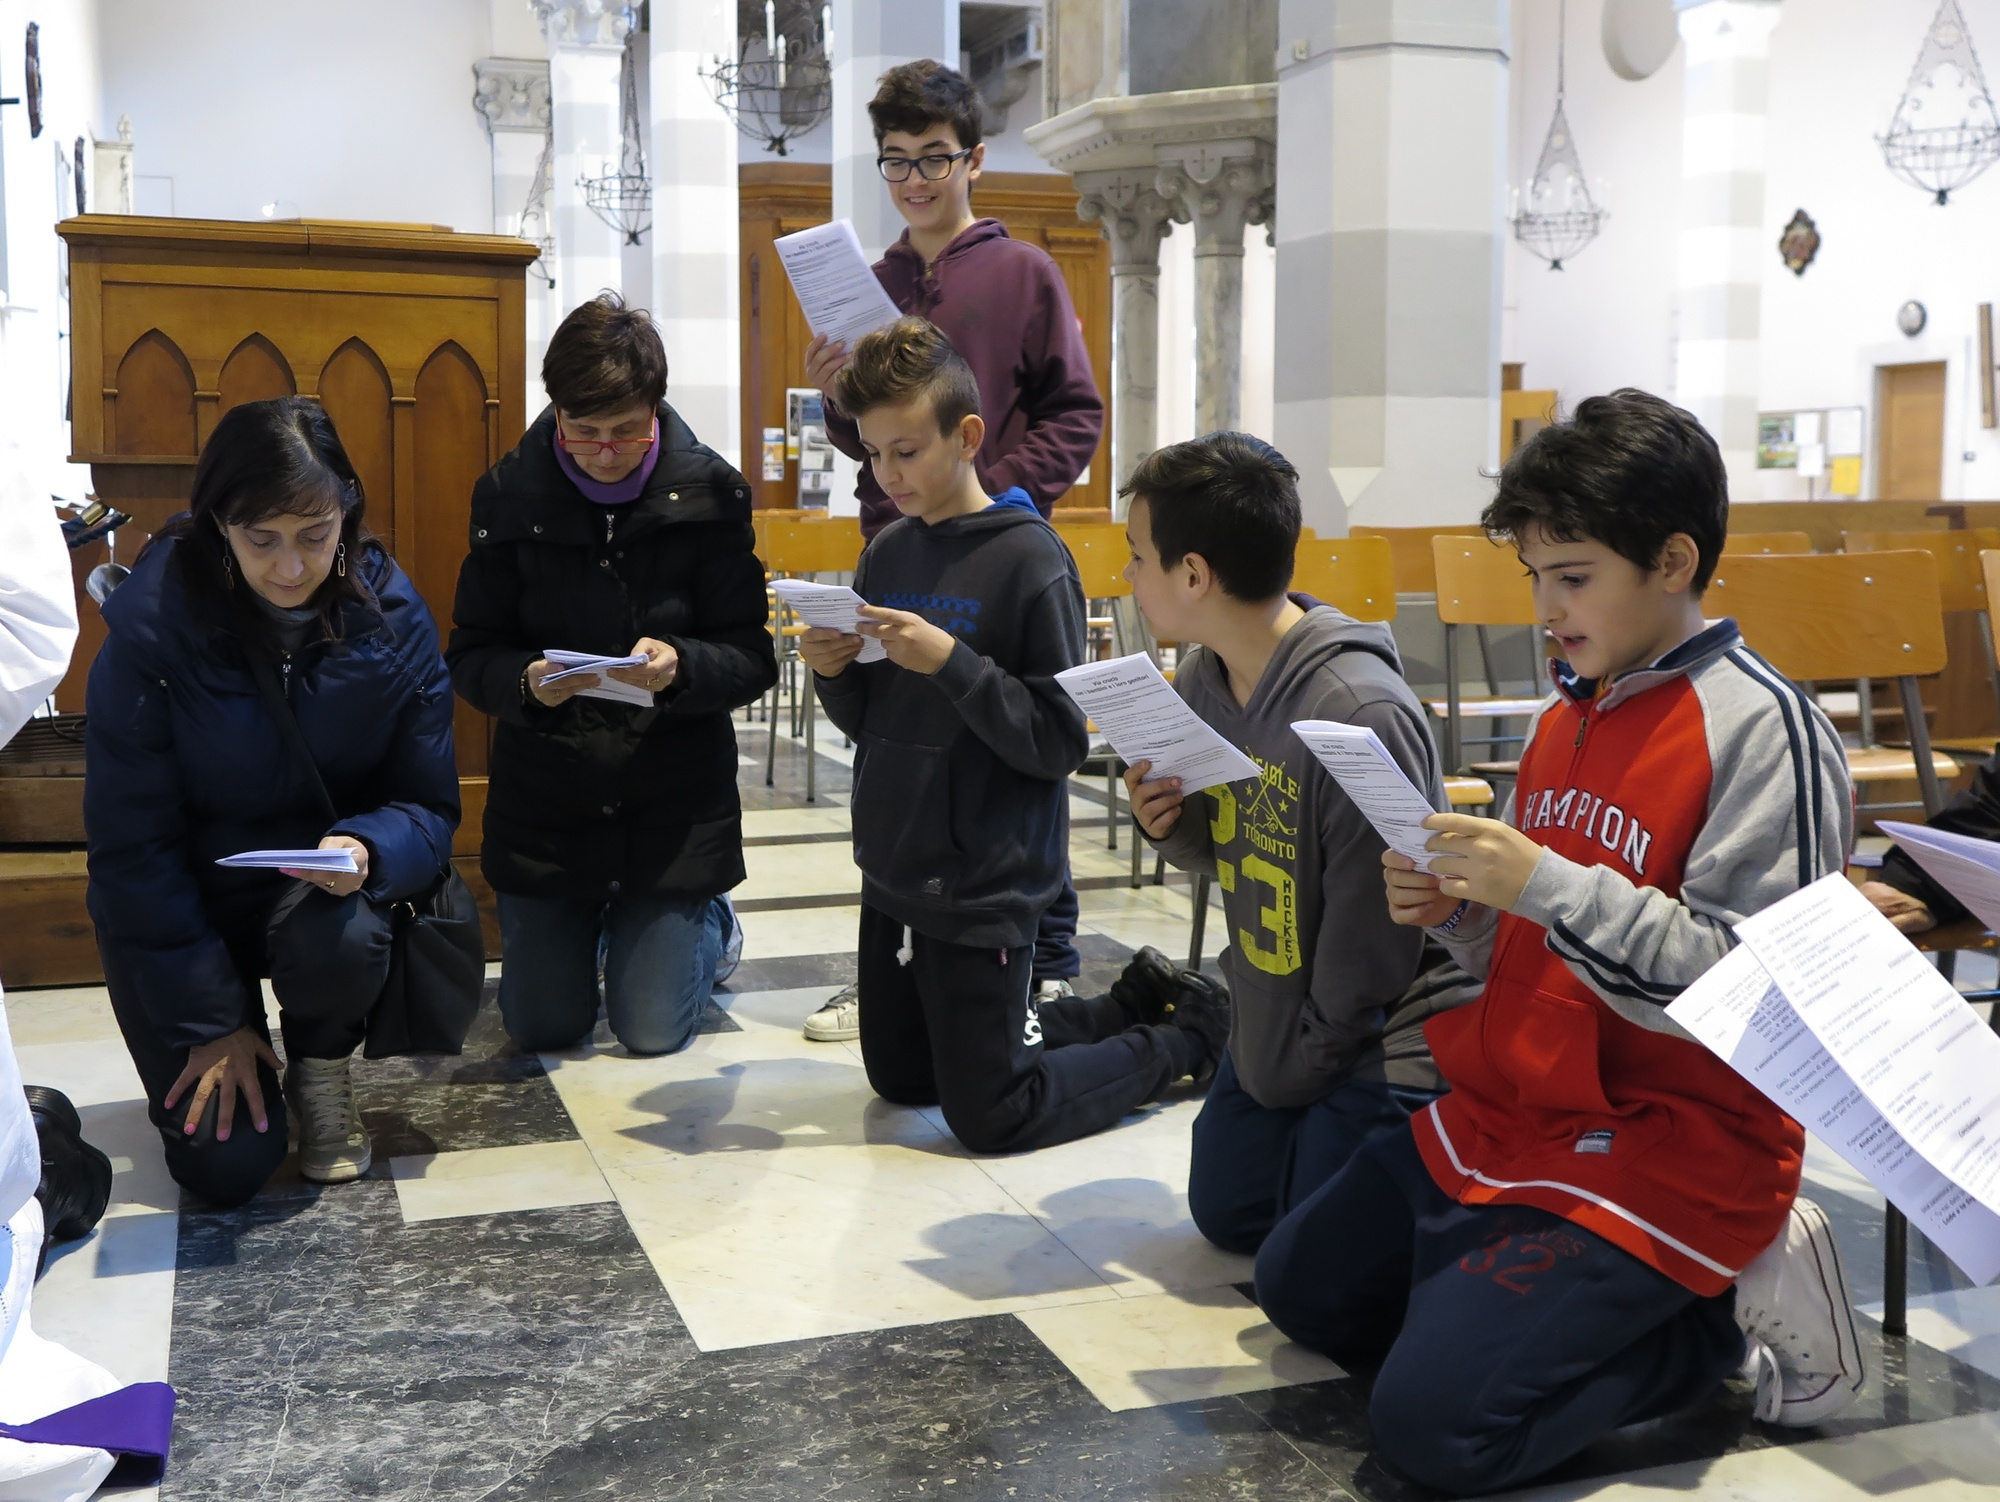 via-crucis-catechismo-2016-03-18-15-32-14